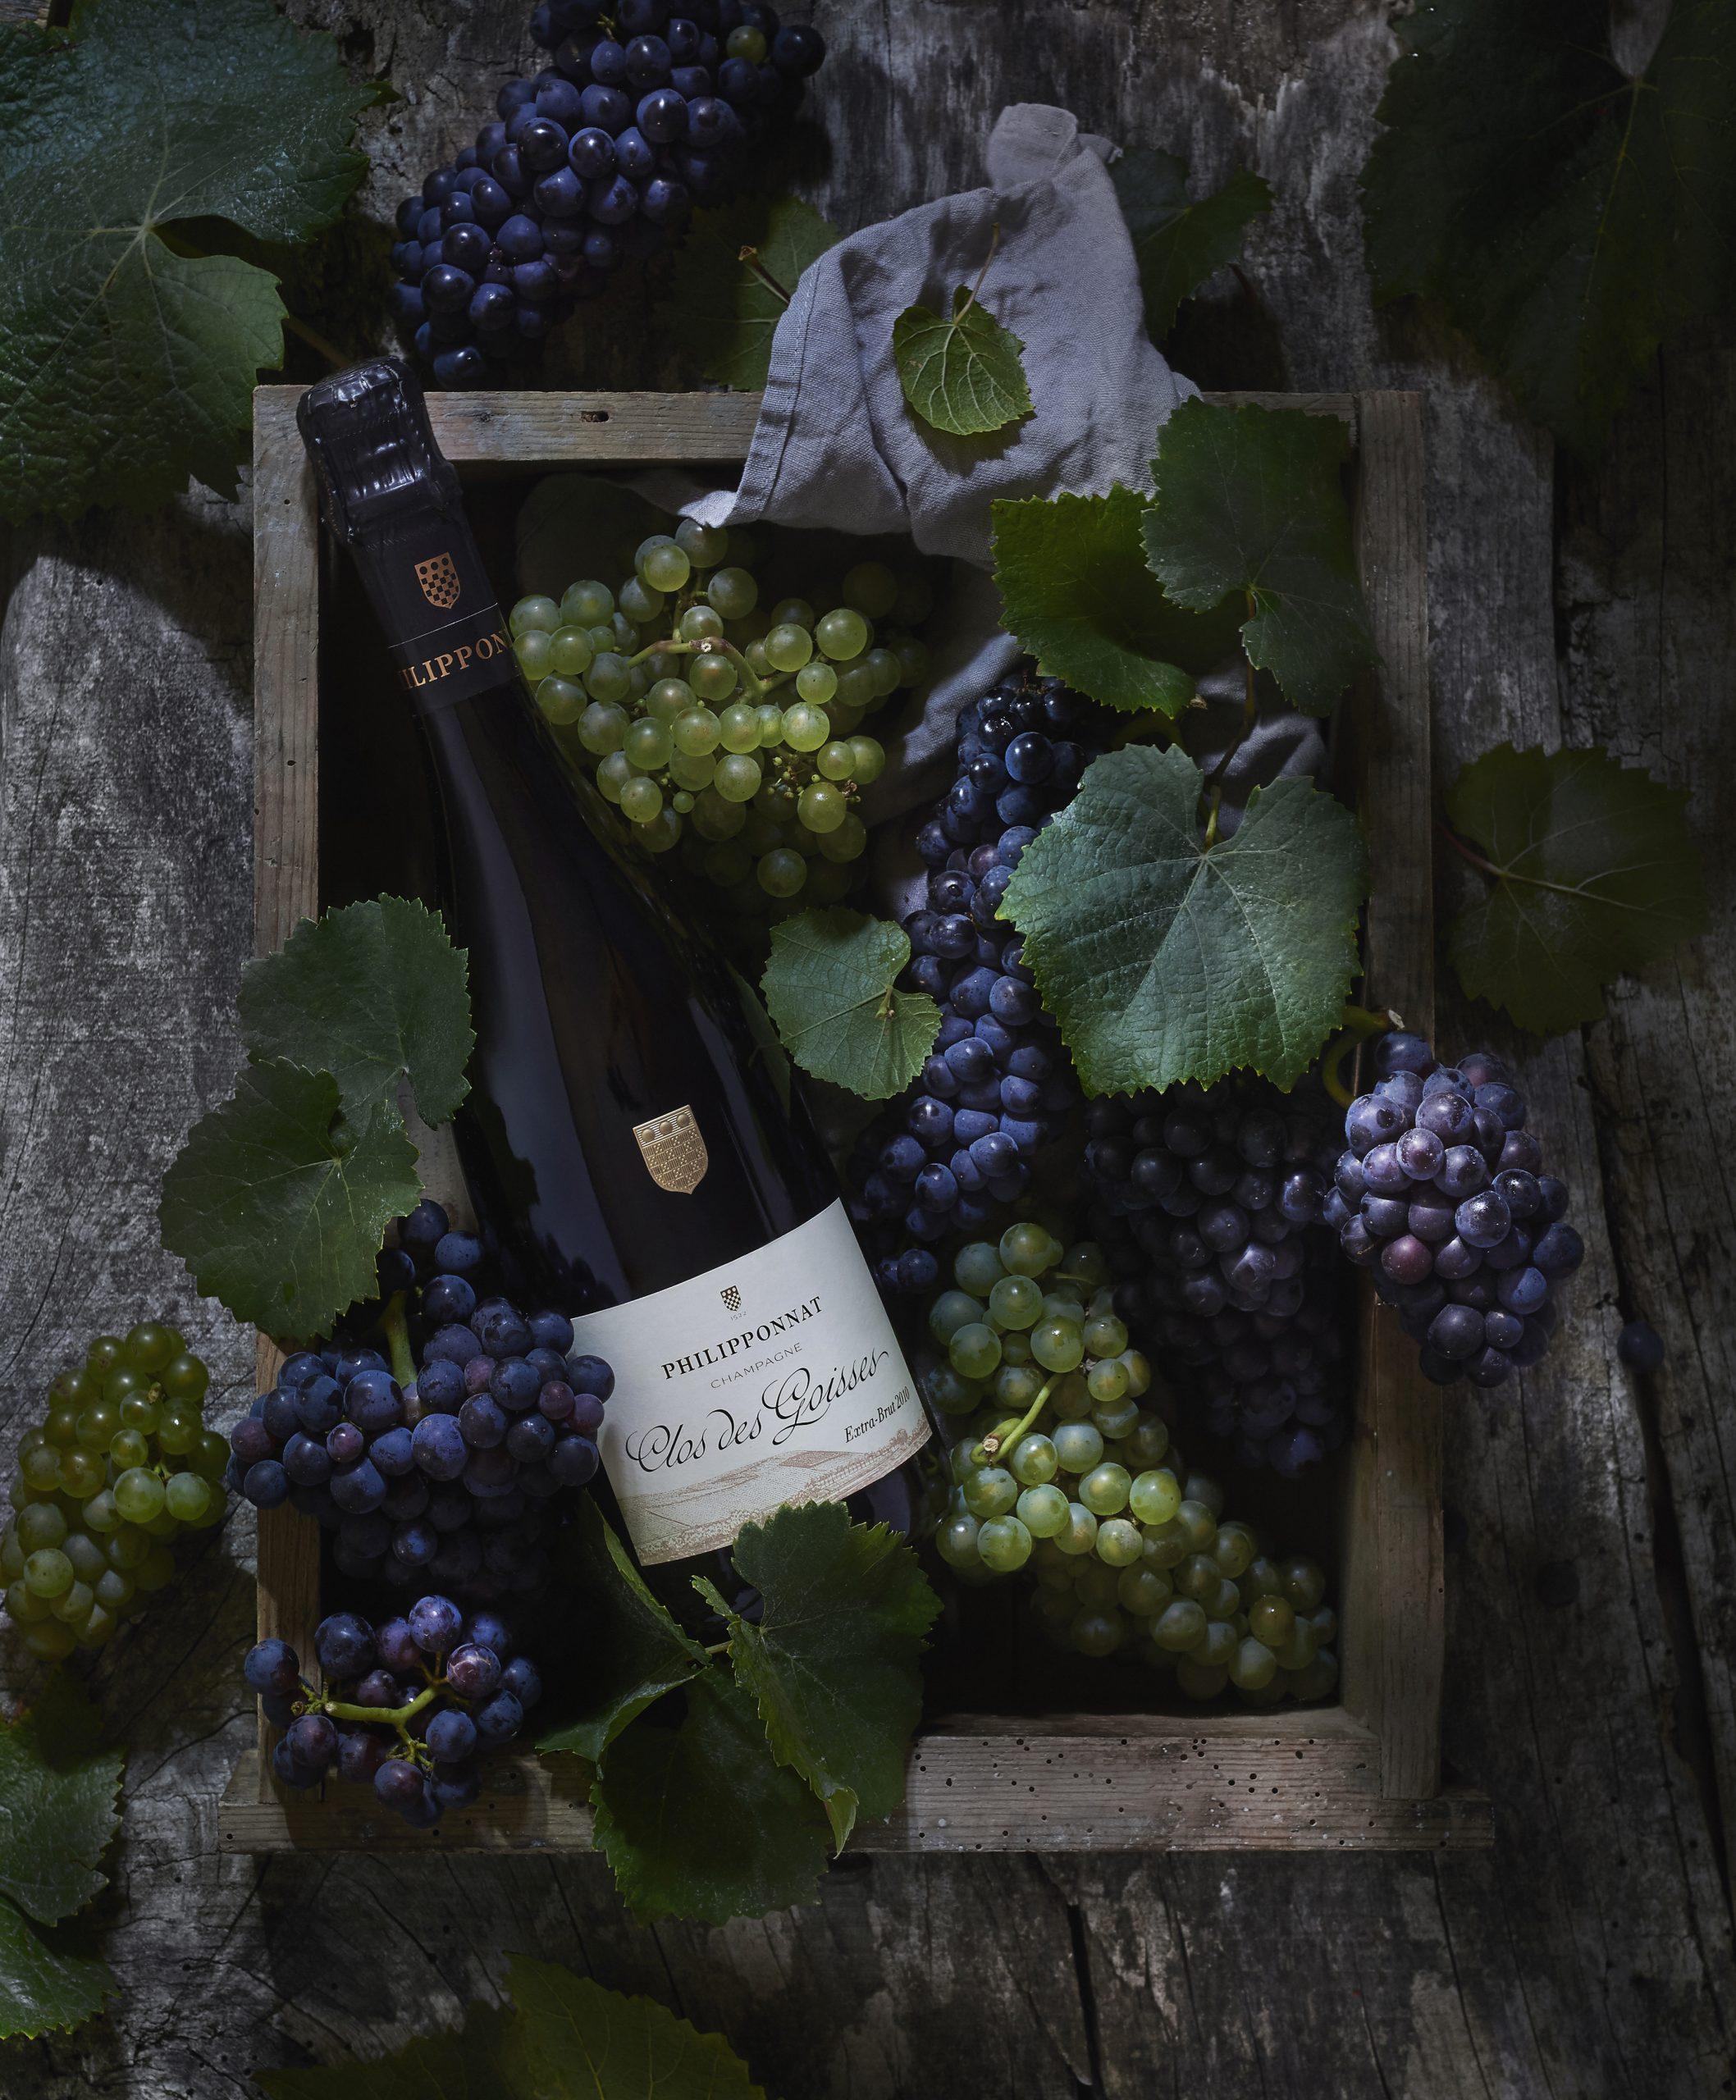 Clos des Goisses Extra-Brut 2009 - Champagne Philipponnat